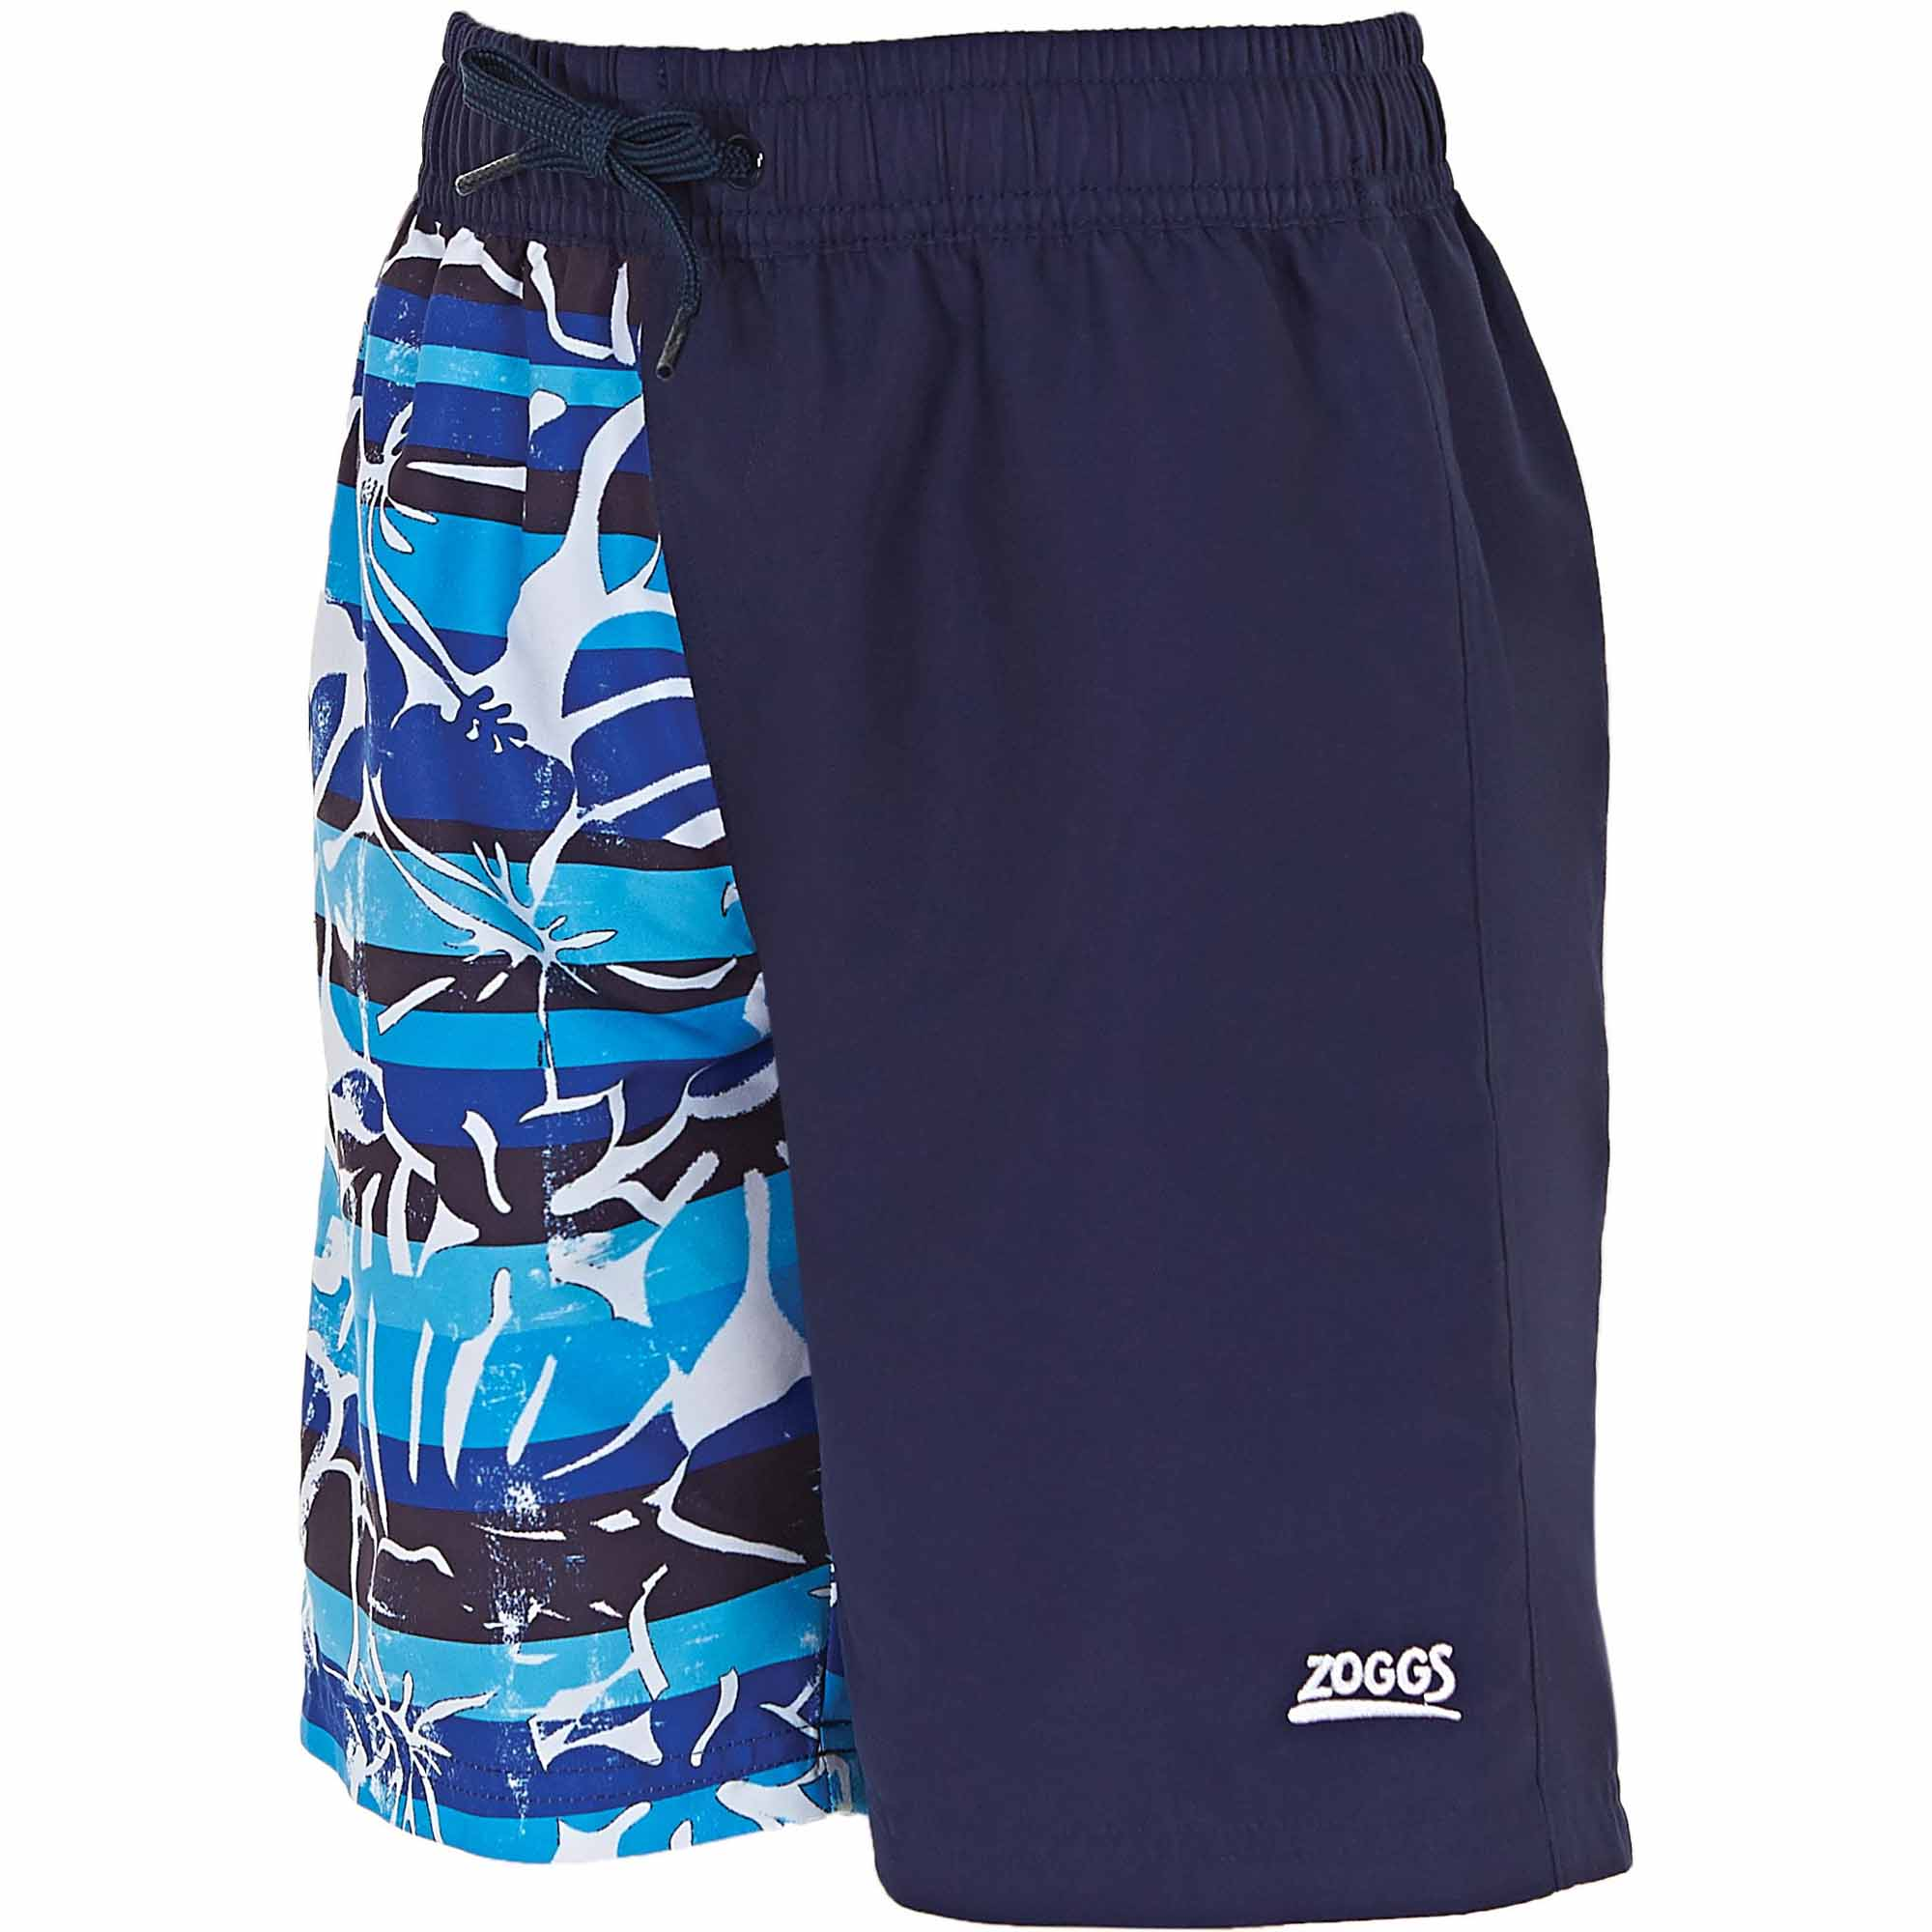 Zoggs Boys Swimming Shorts